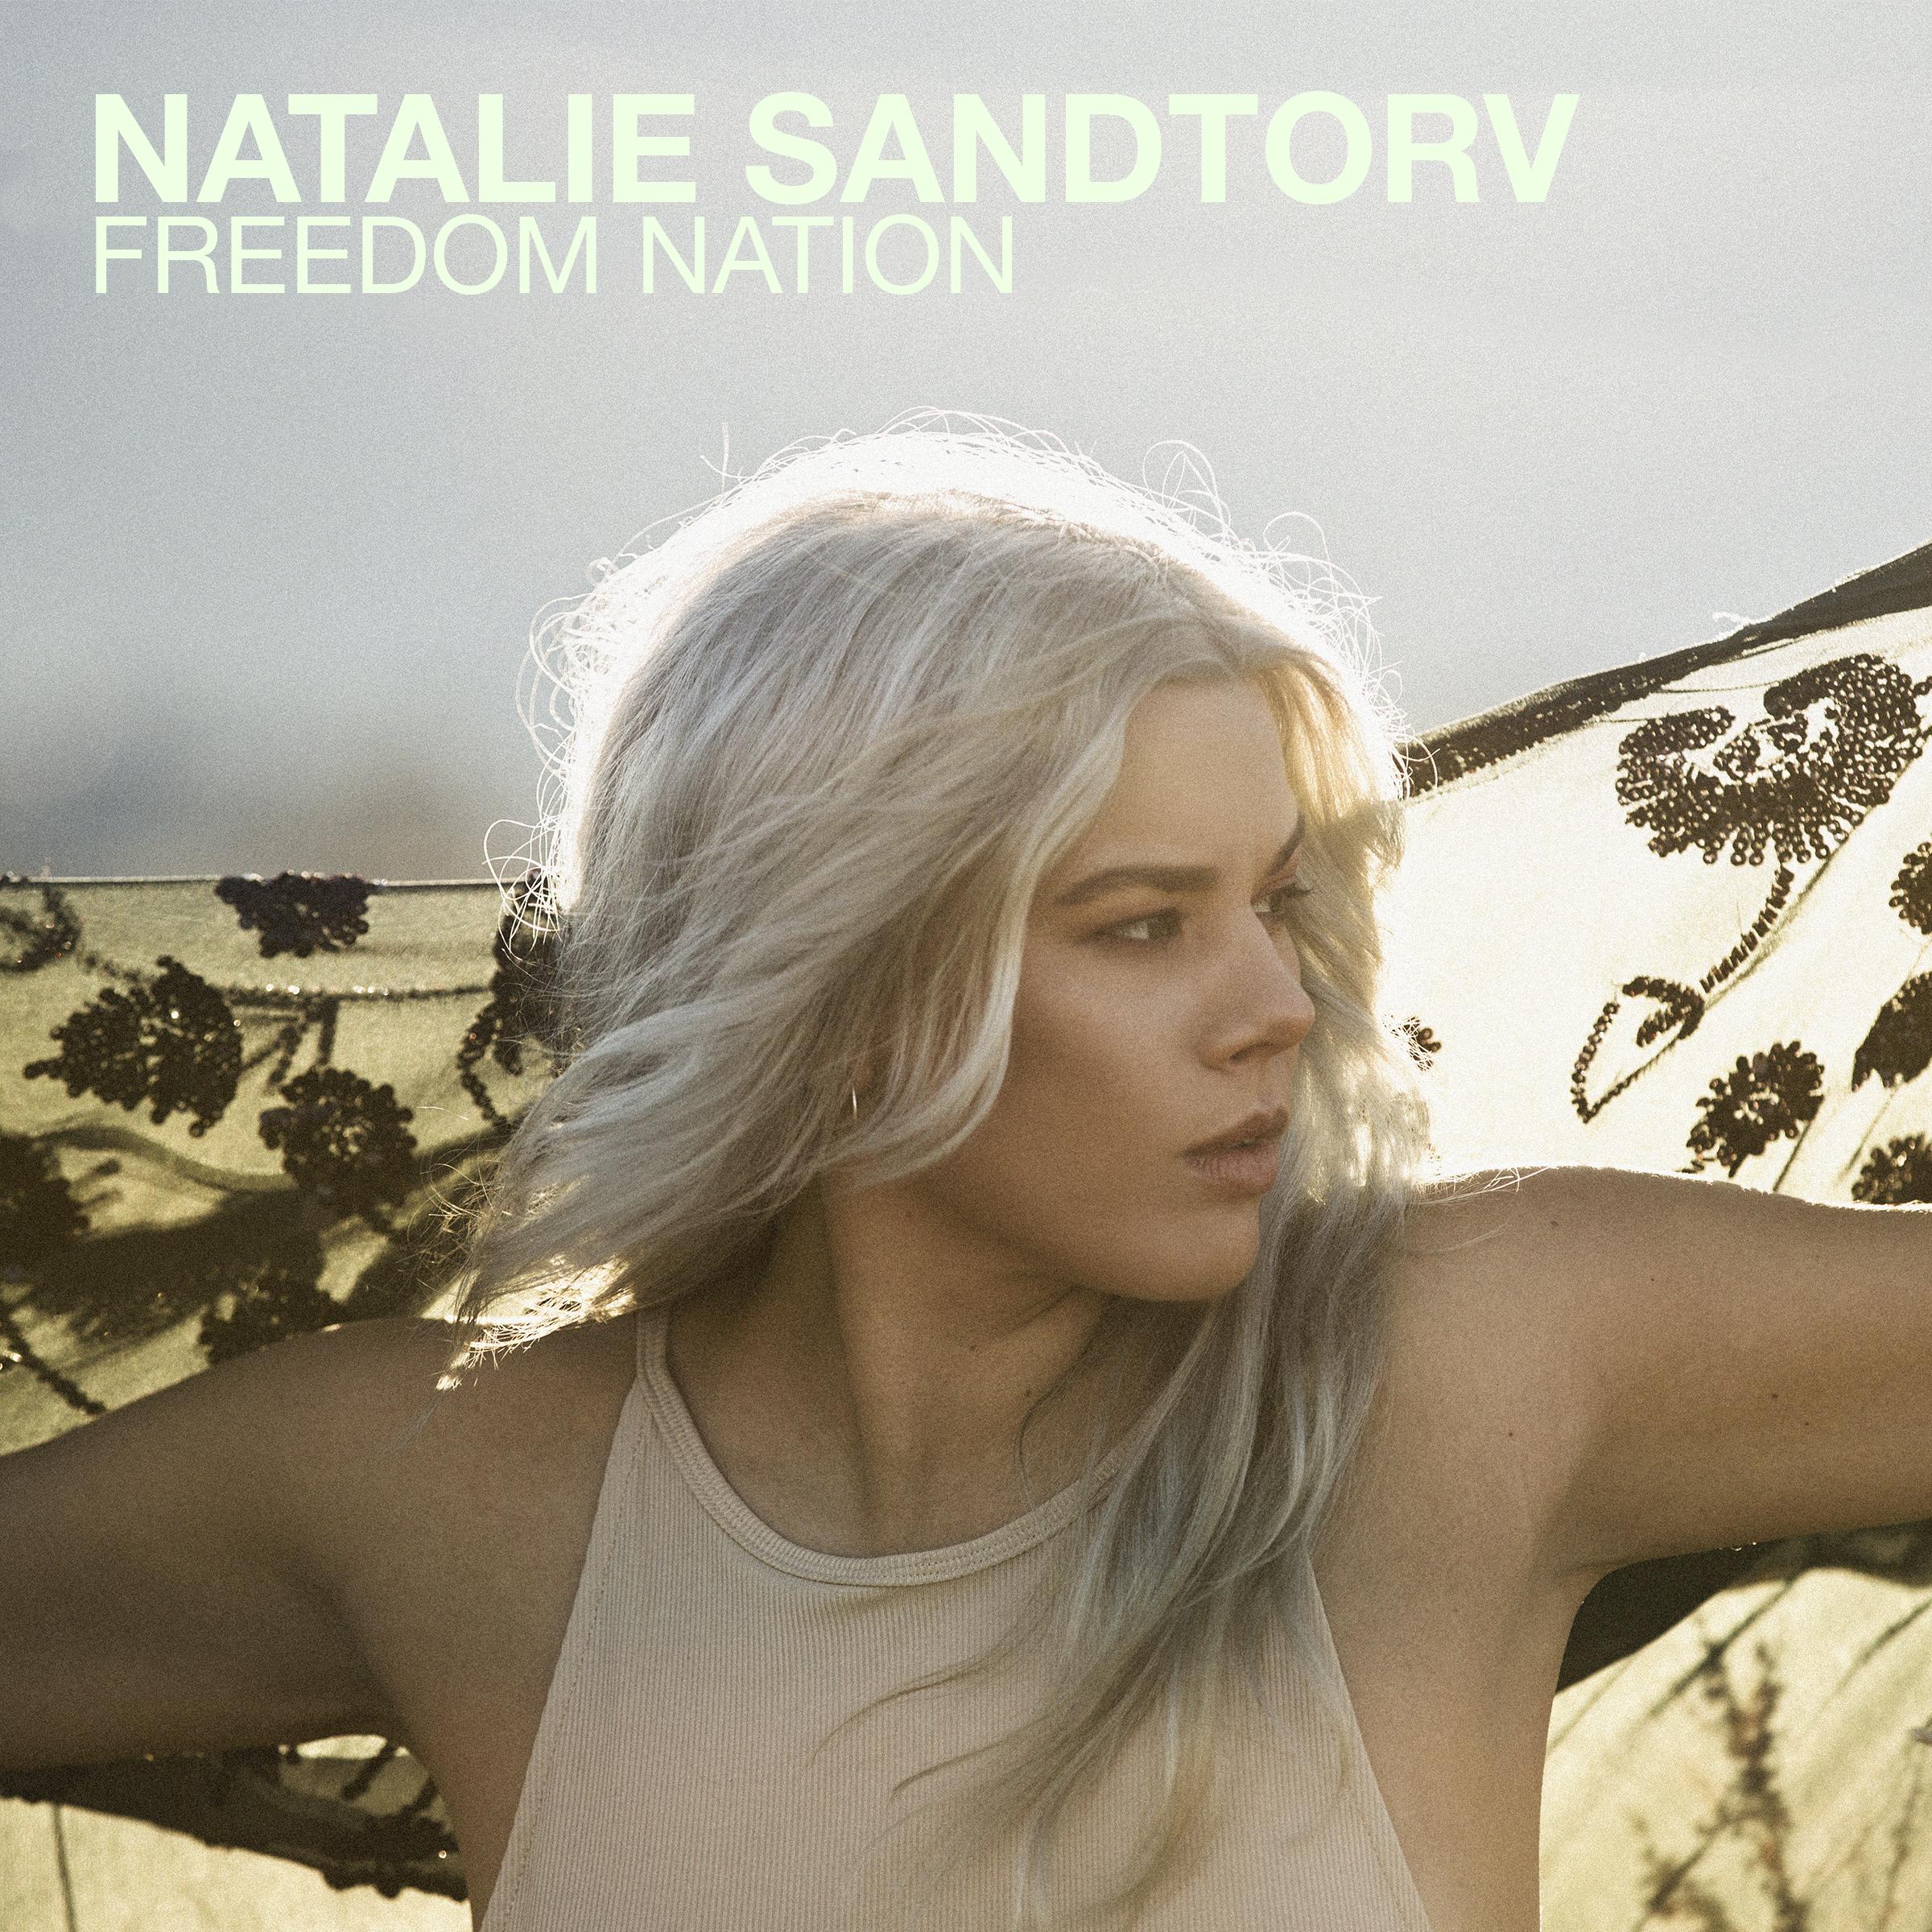 Natalie Sandtorv - Freedom Nation